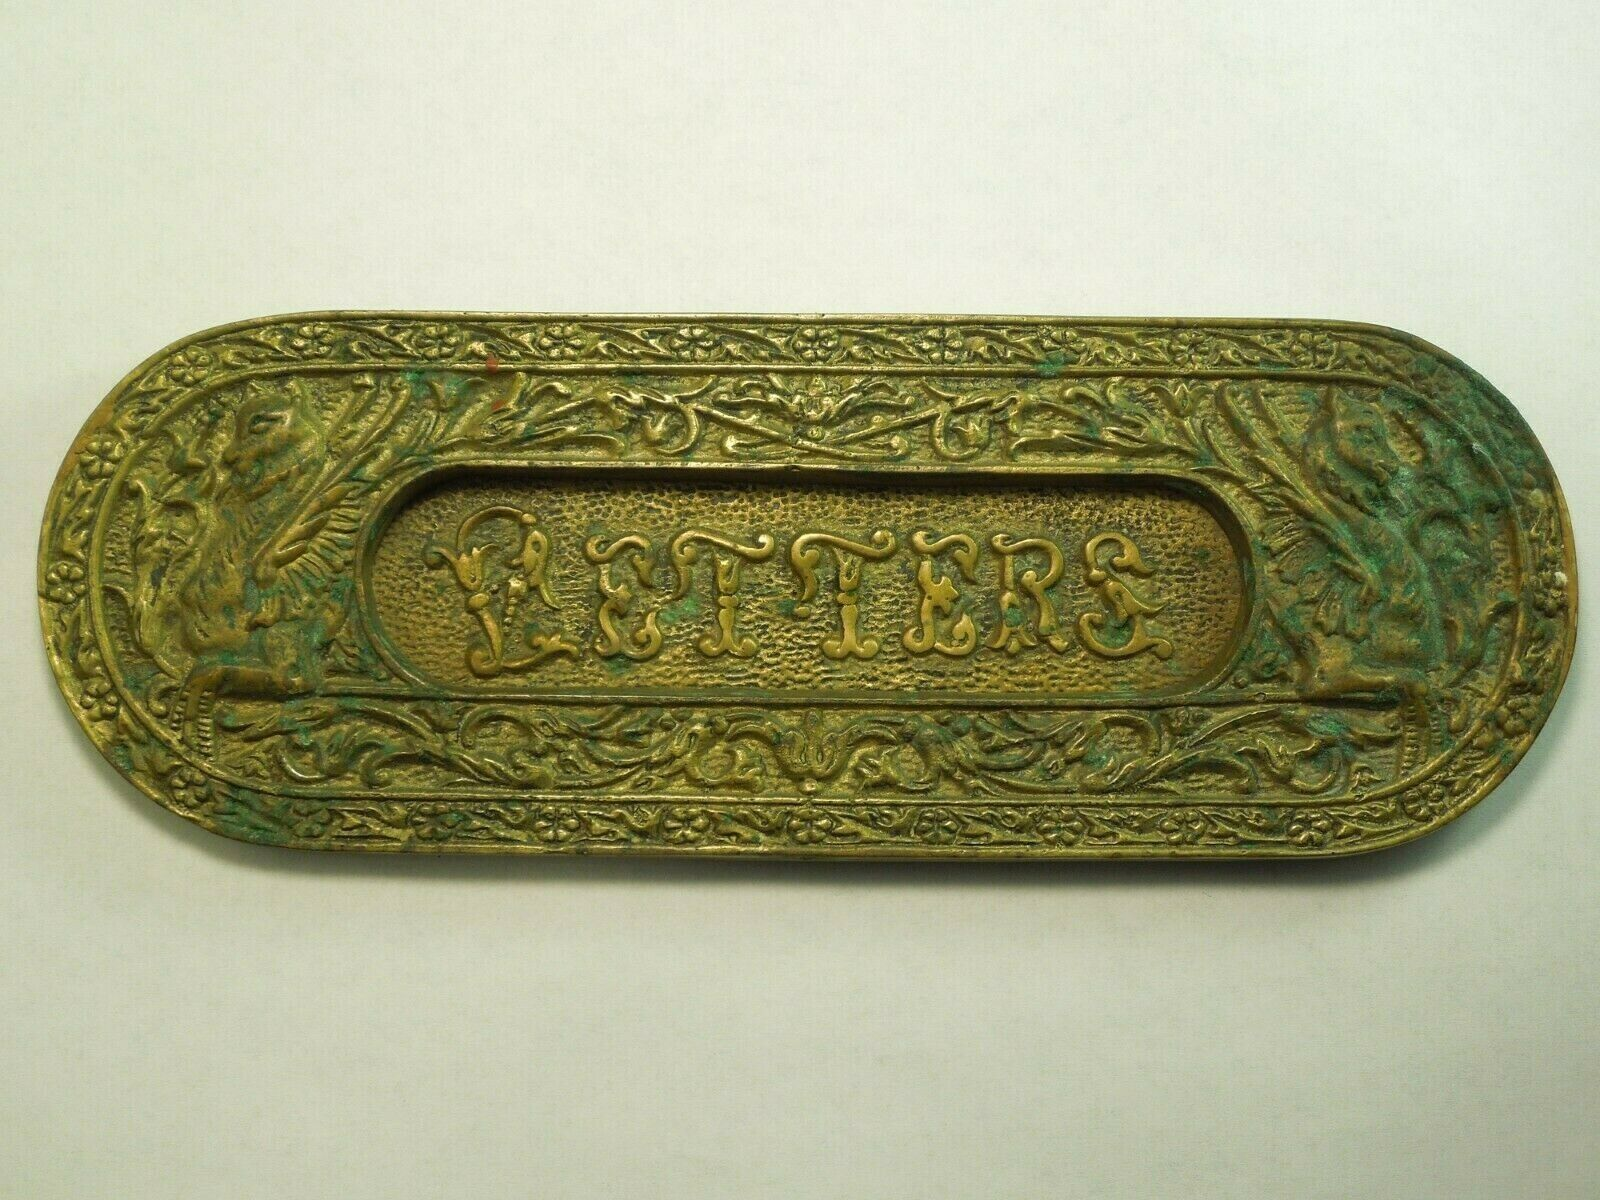 Antique Ornate Brass Letter Mail Door Slot W  Dragon Pegasus Creature Art